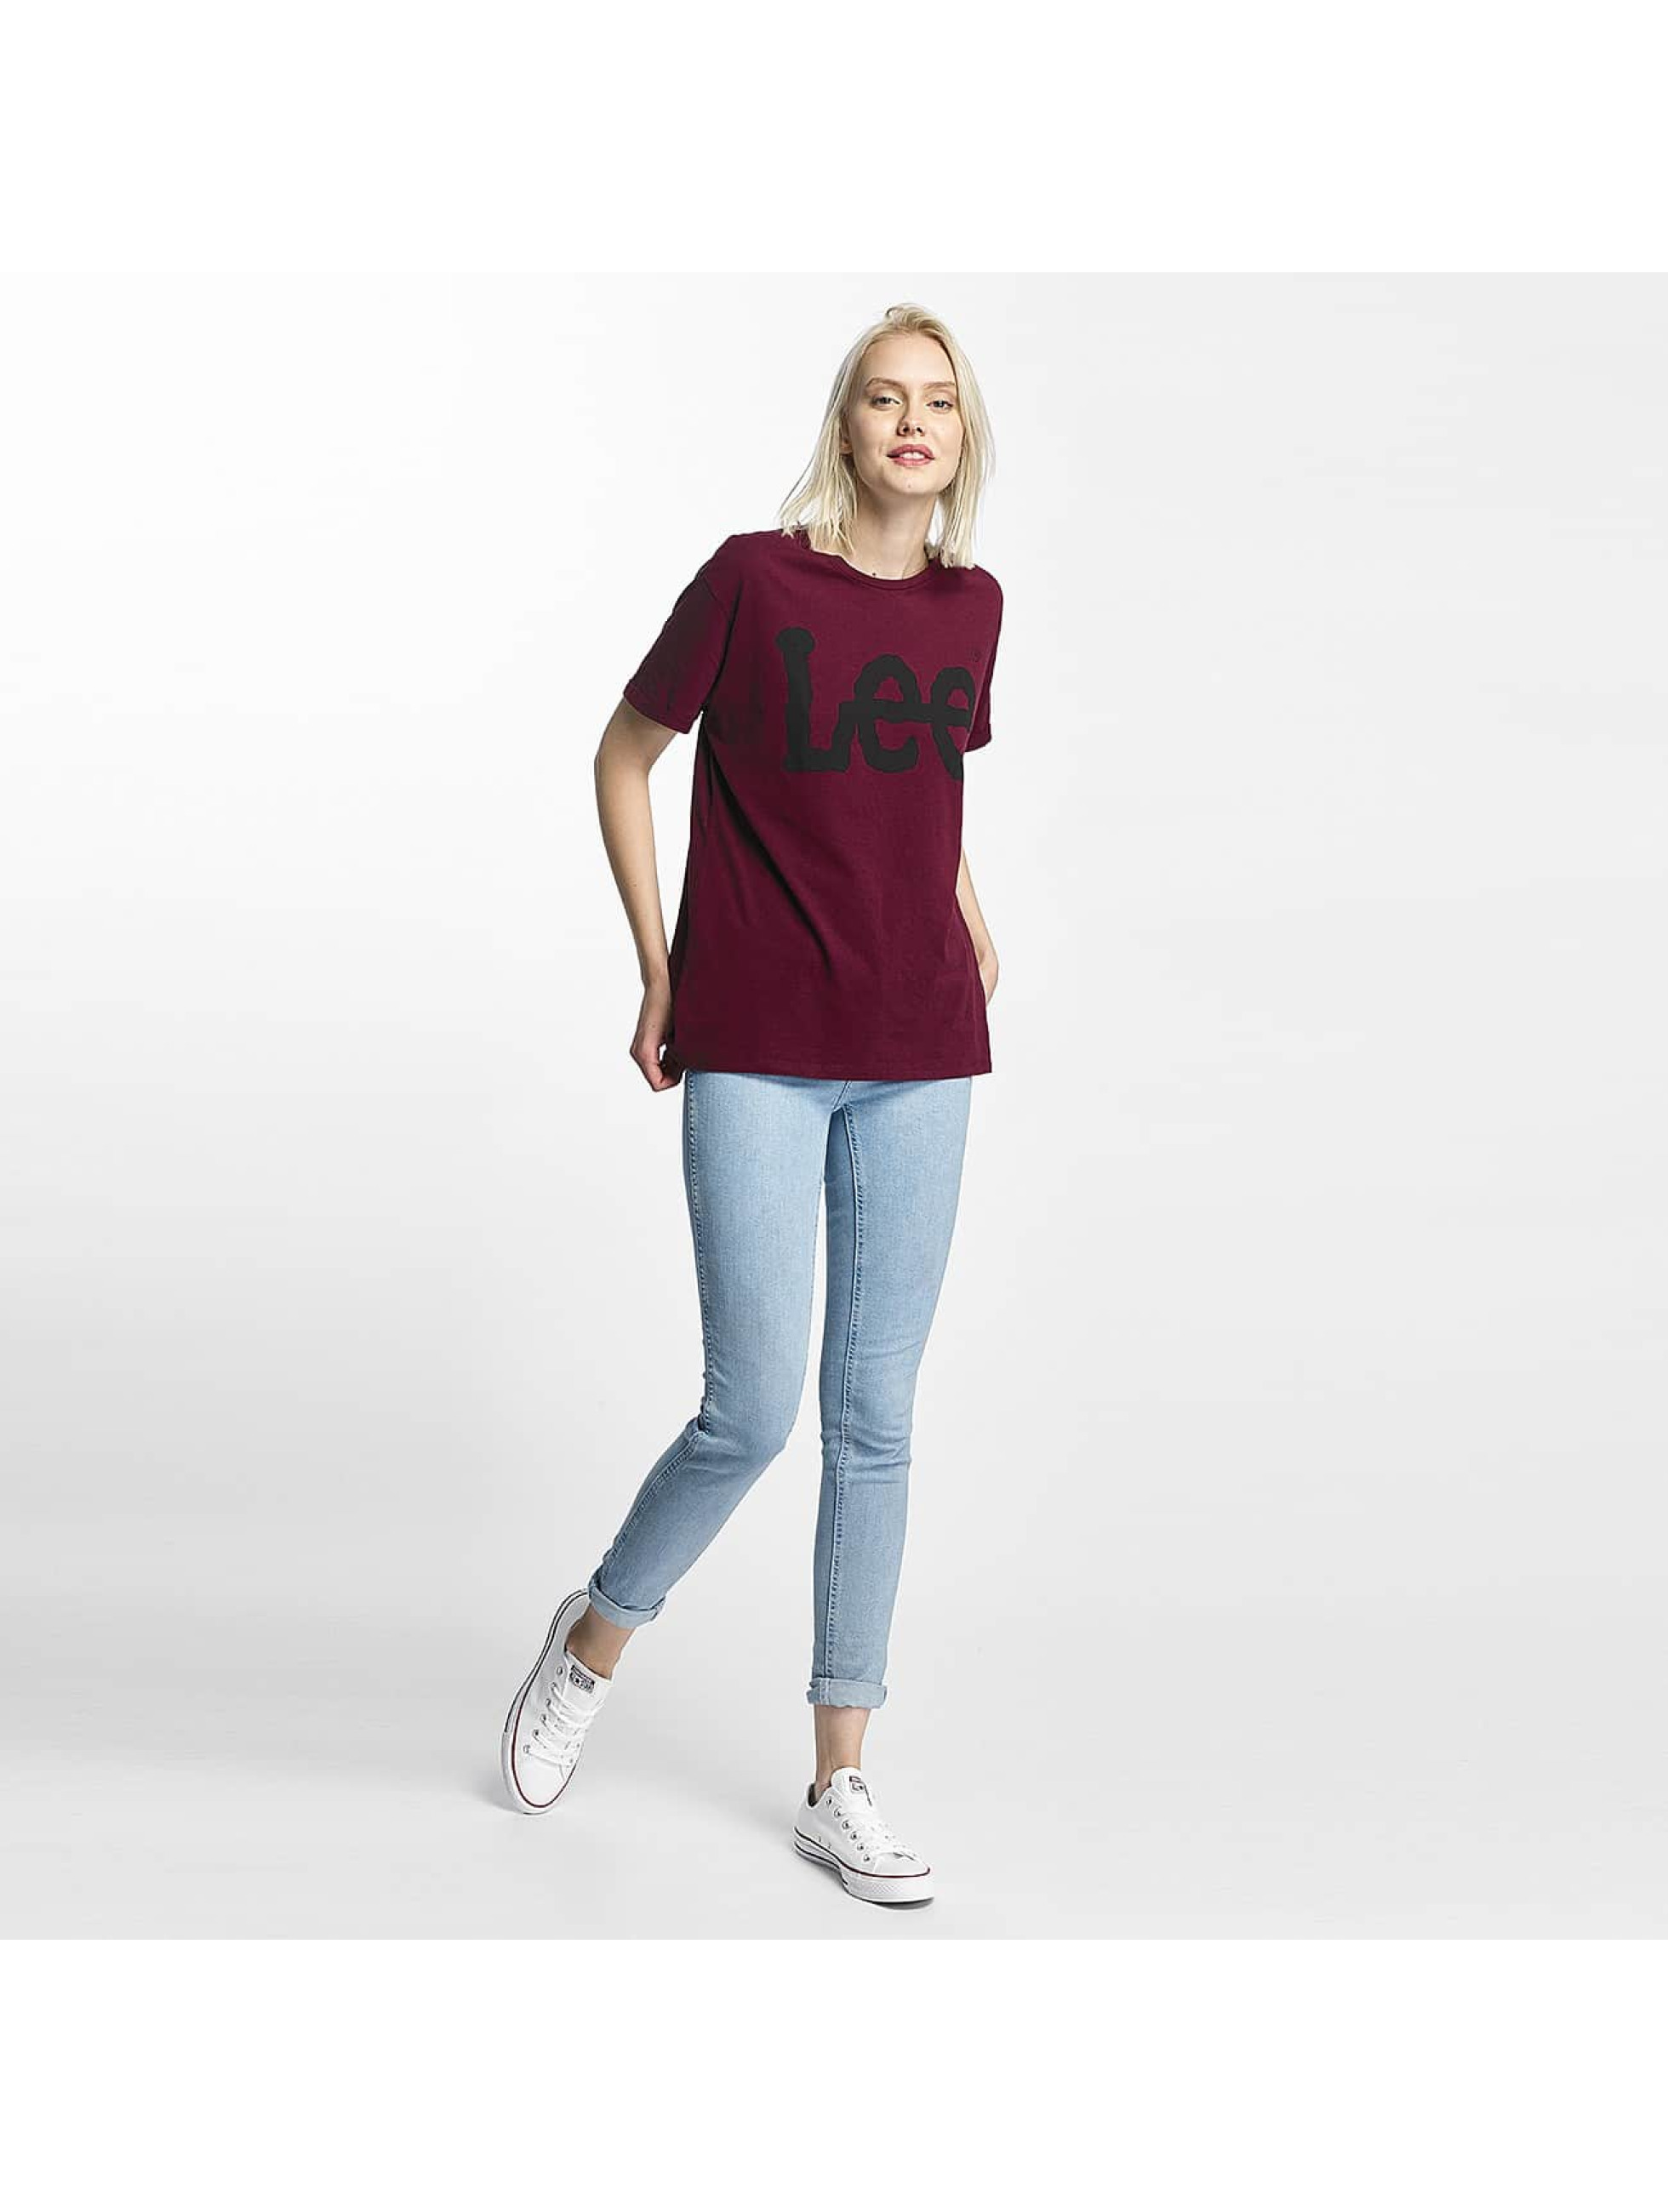 Lee t-shirt Logo rood